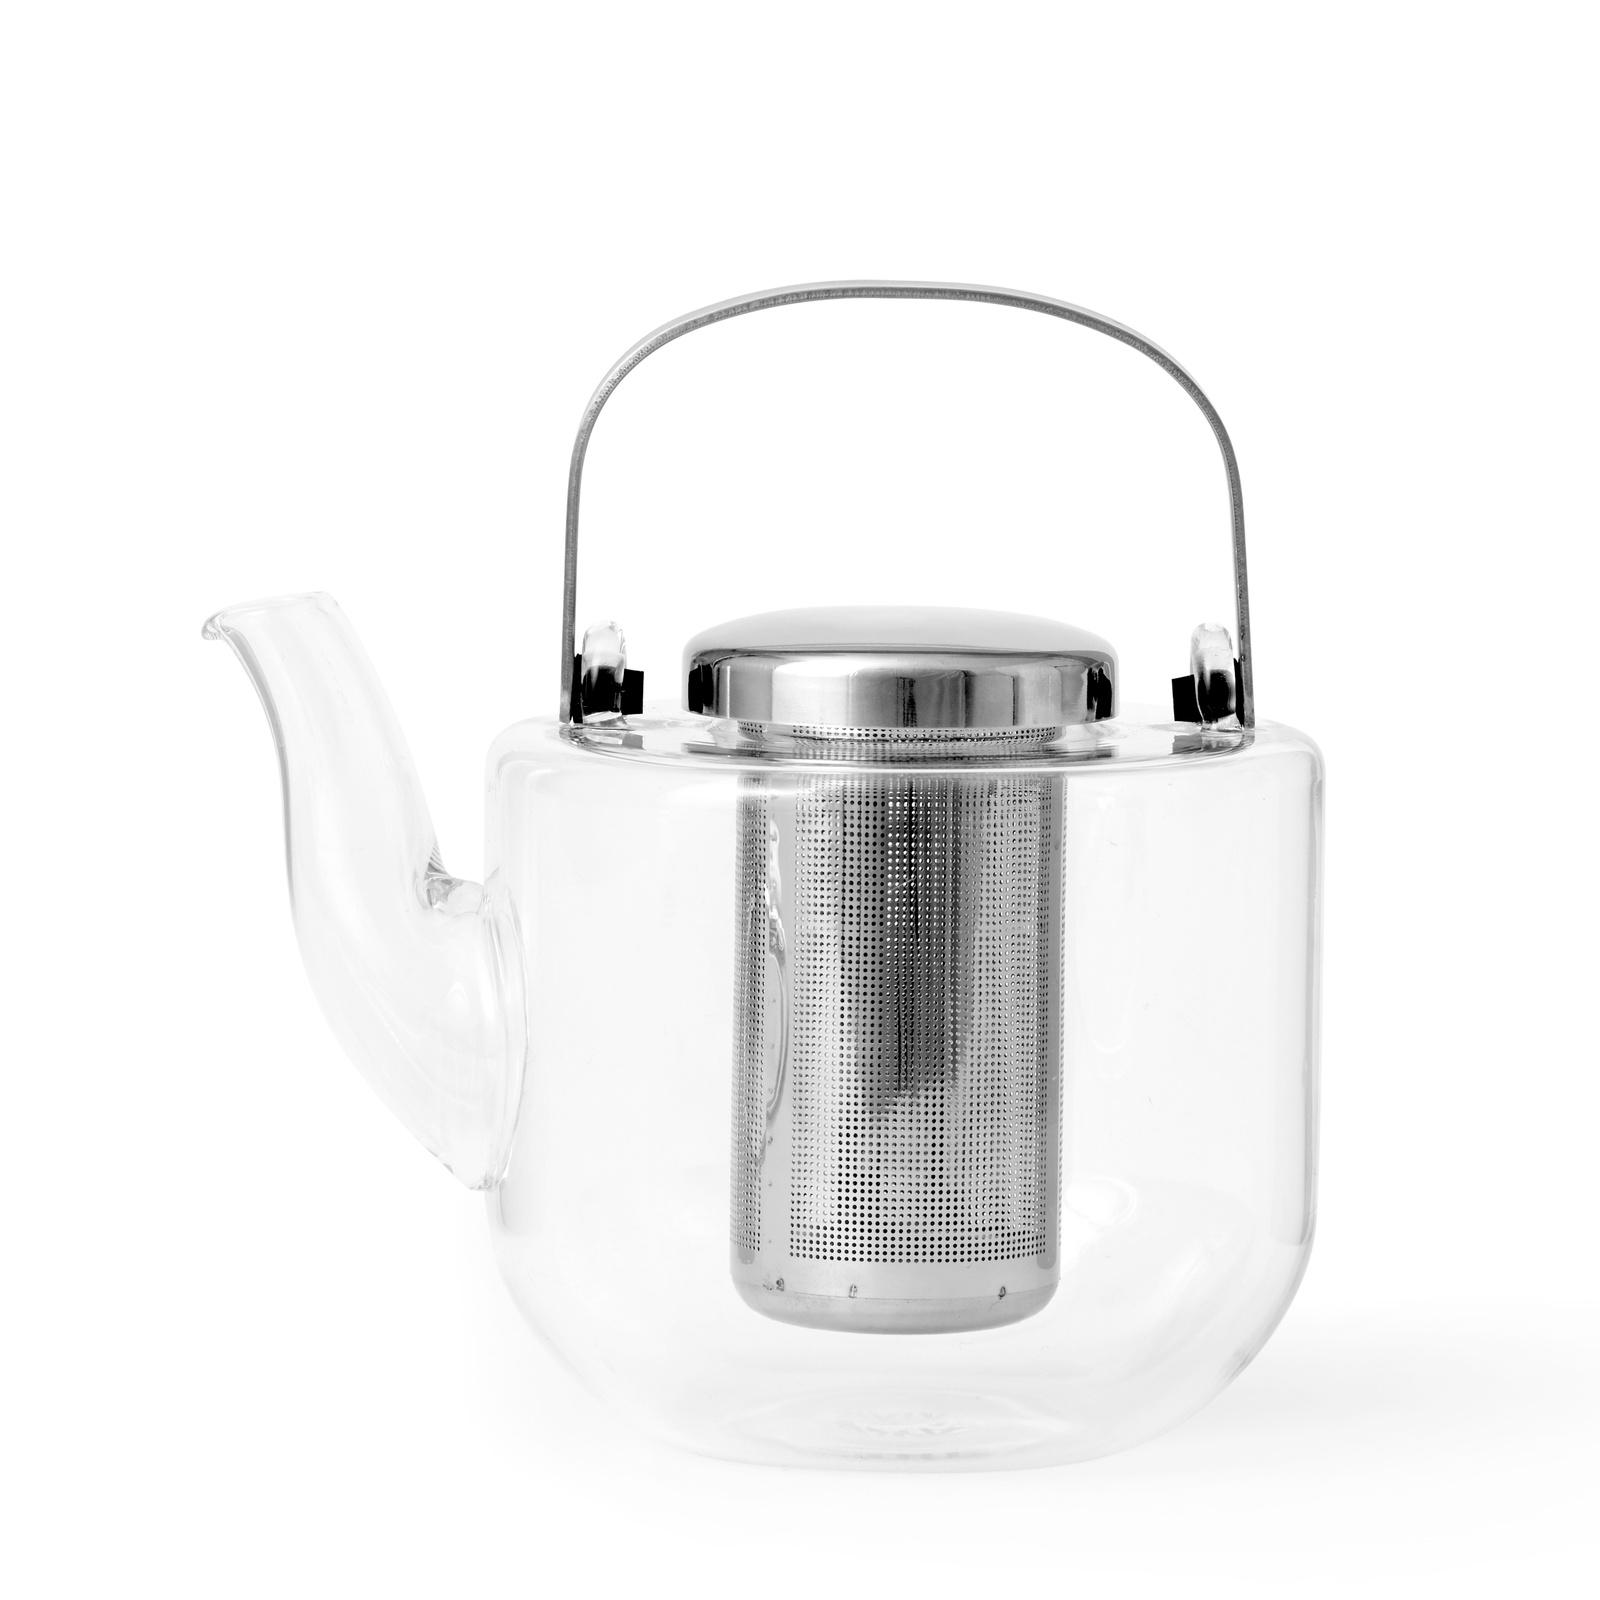 Чайник заварочный Viva scandinavia Bjorn с ситечком, V34301, 750 мл цена 2017